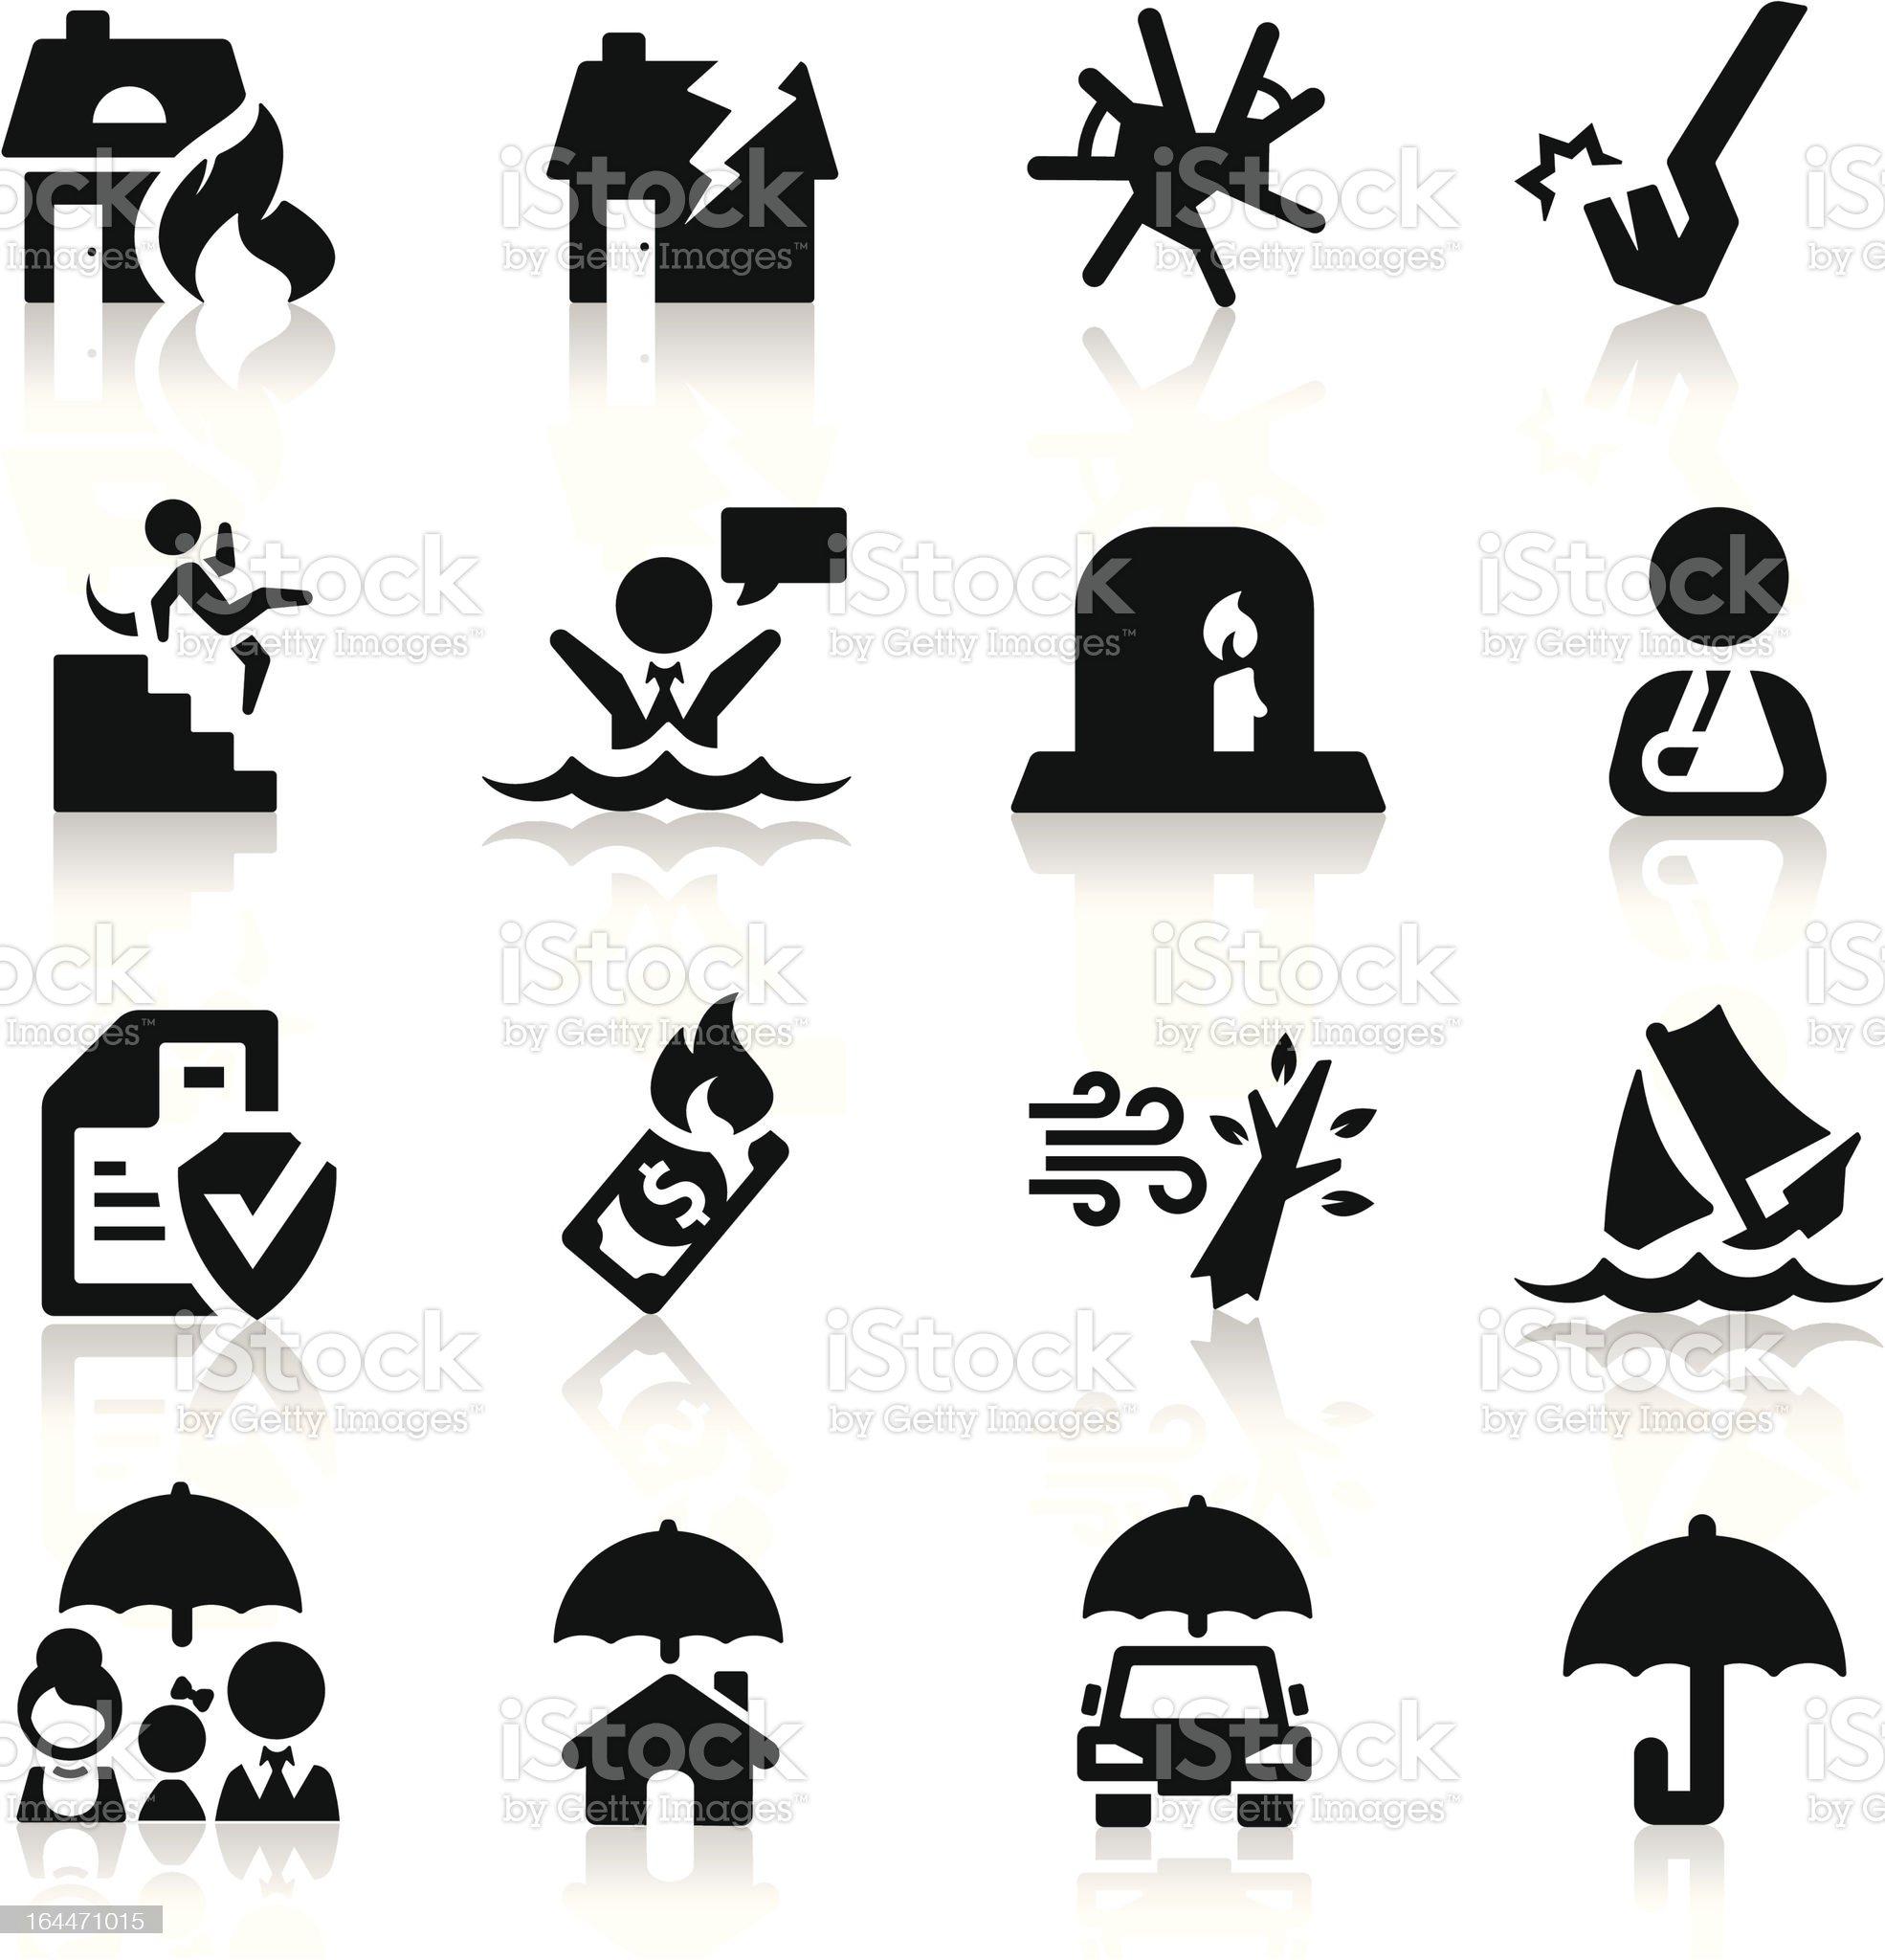 Insurance icons set Elegant series royalty-free stock vector art